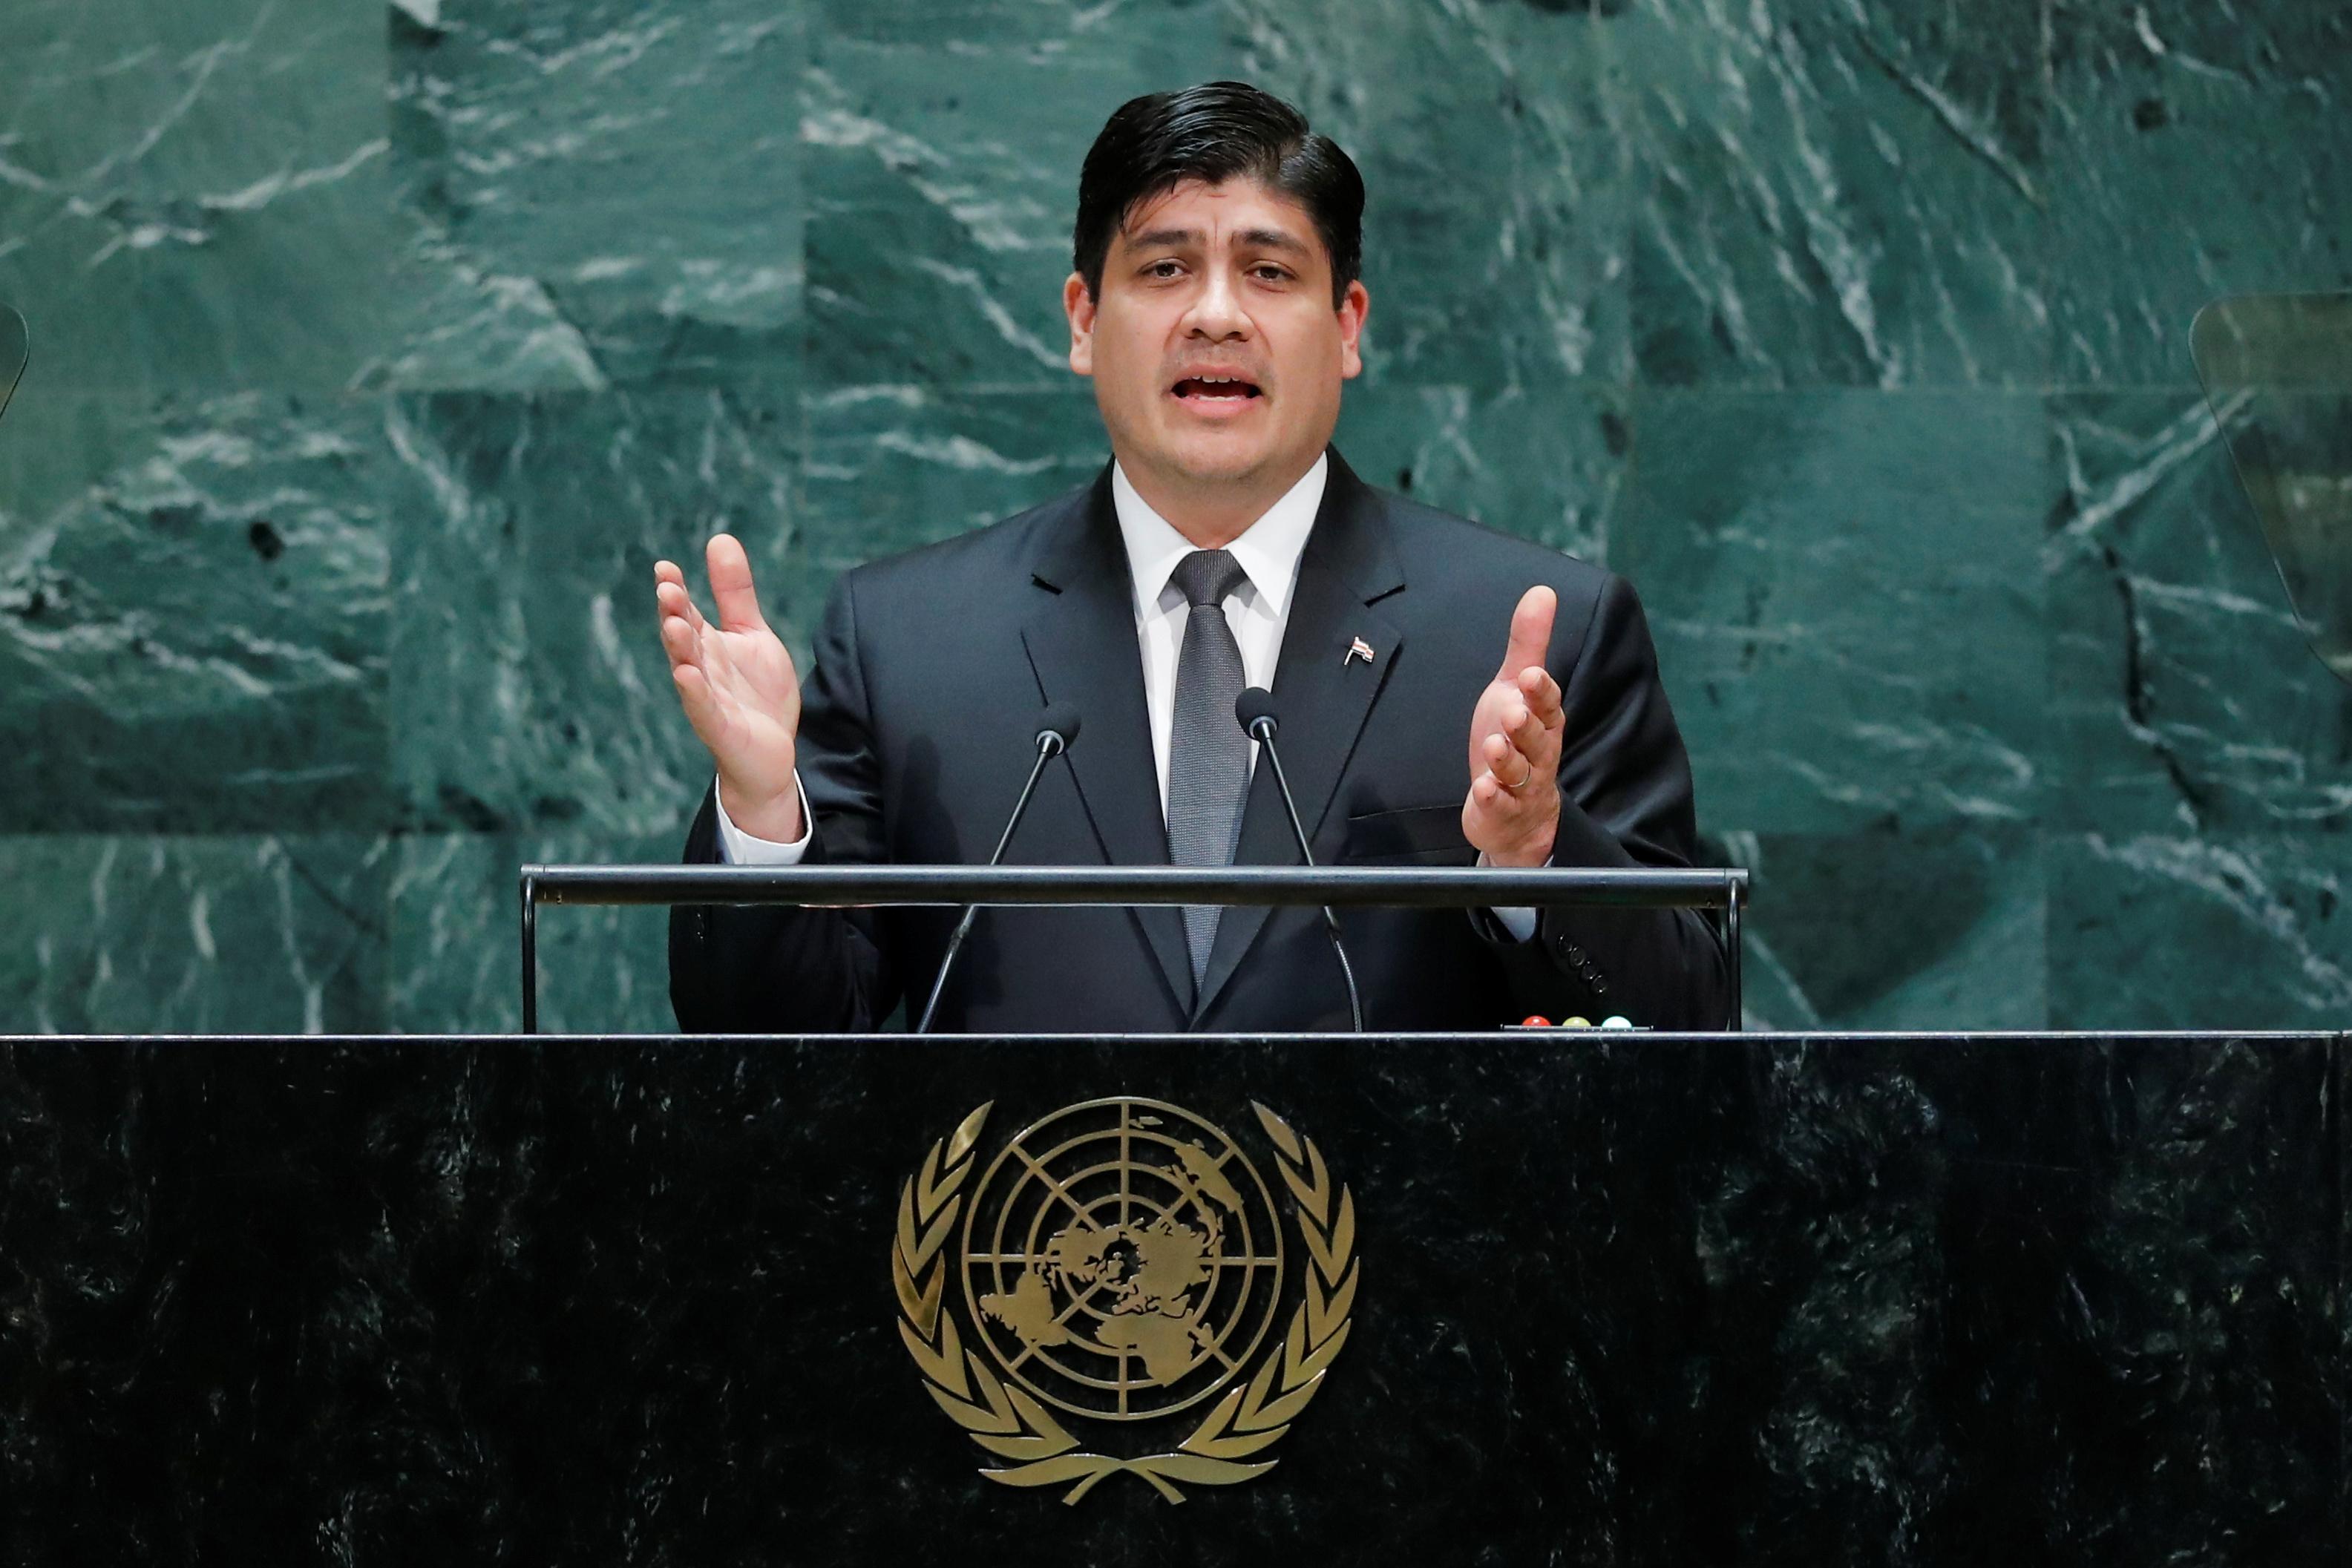 Venezuela wins seat on U.N. rights council despite U.S. opposition